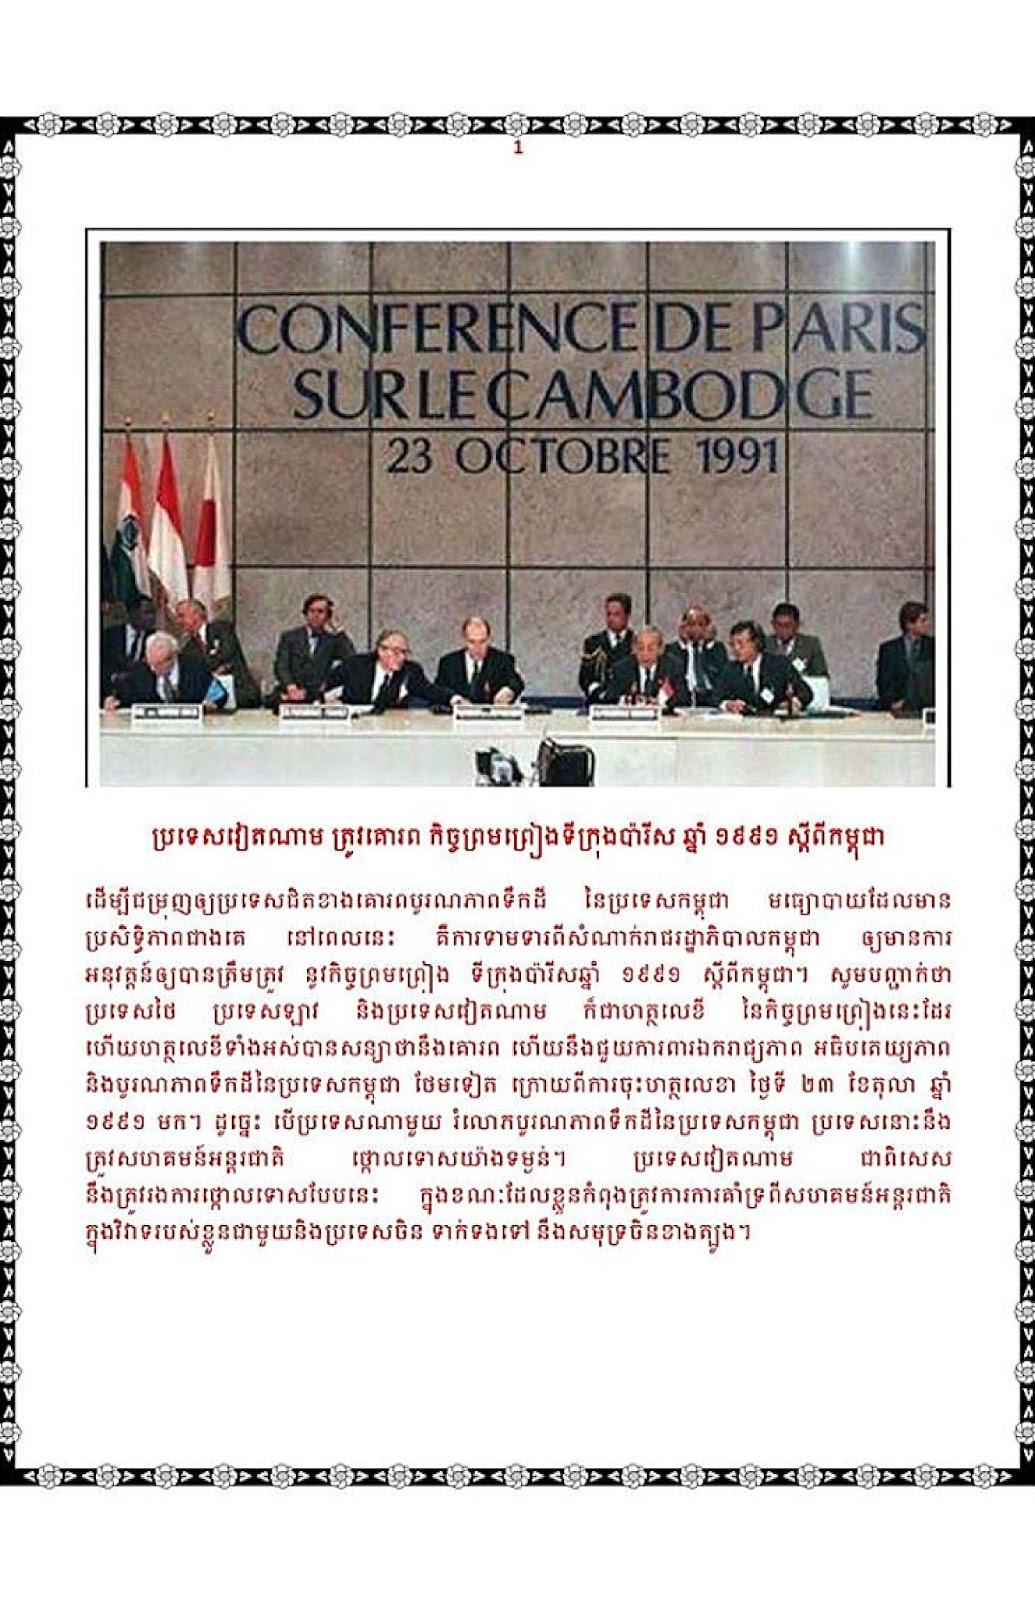 Cambodia Today Vietnam Must Respect Paris Peace Agreement October